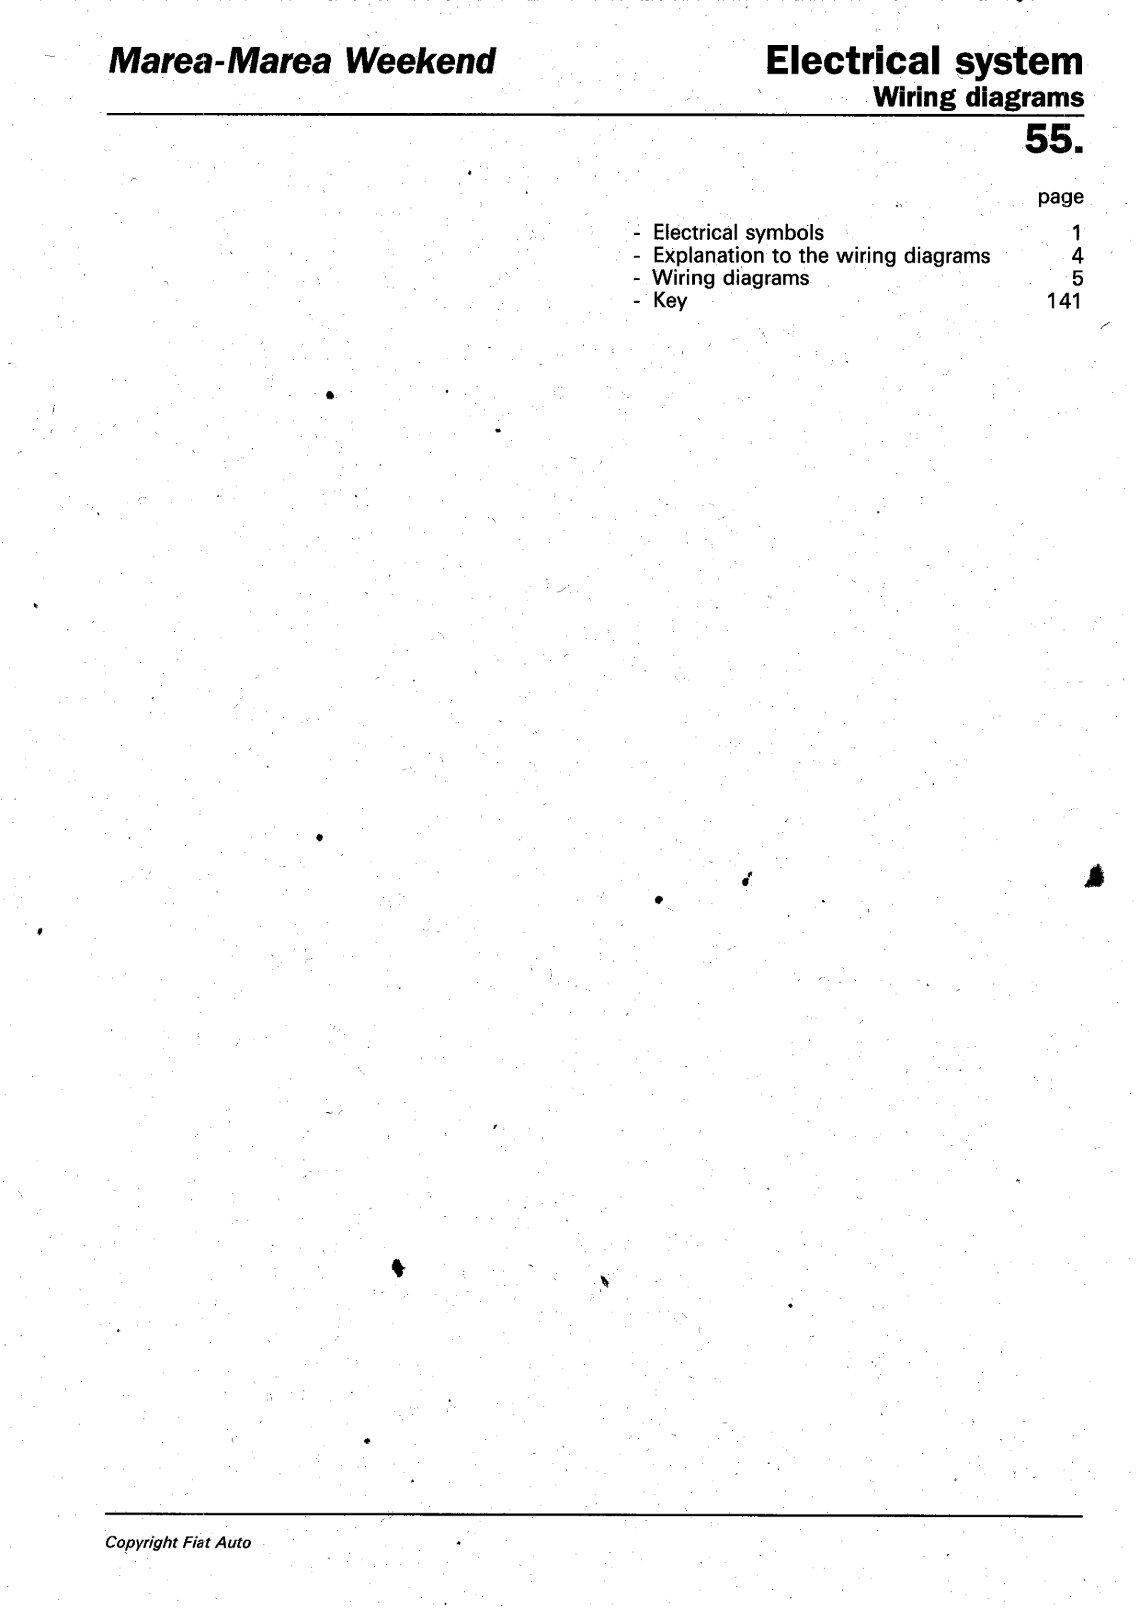 fiat palio weekend wiring diagram question about wiring diagram u2022 1977 fiat 124 spider wiring diagram fiat palio wiring diagram pdf [ 1140 x 1611 Pixel ]